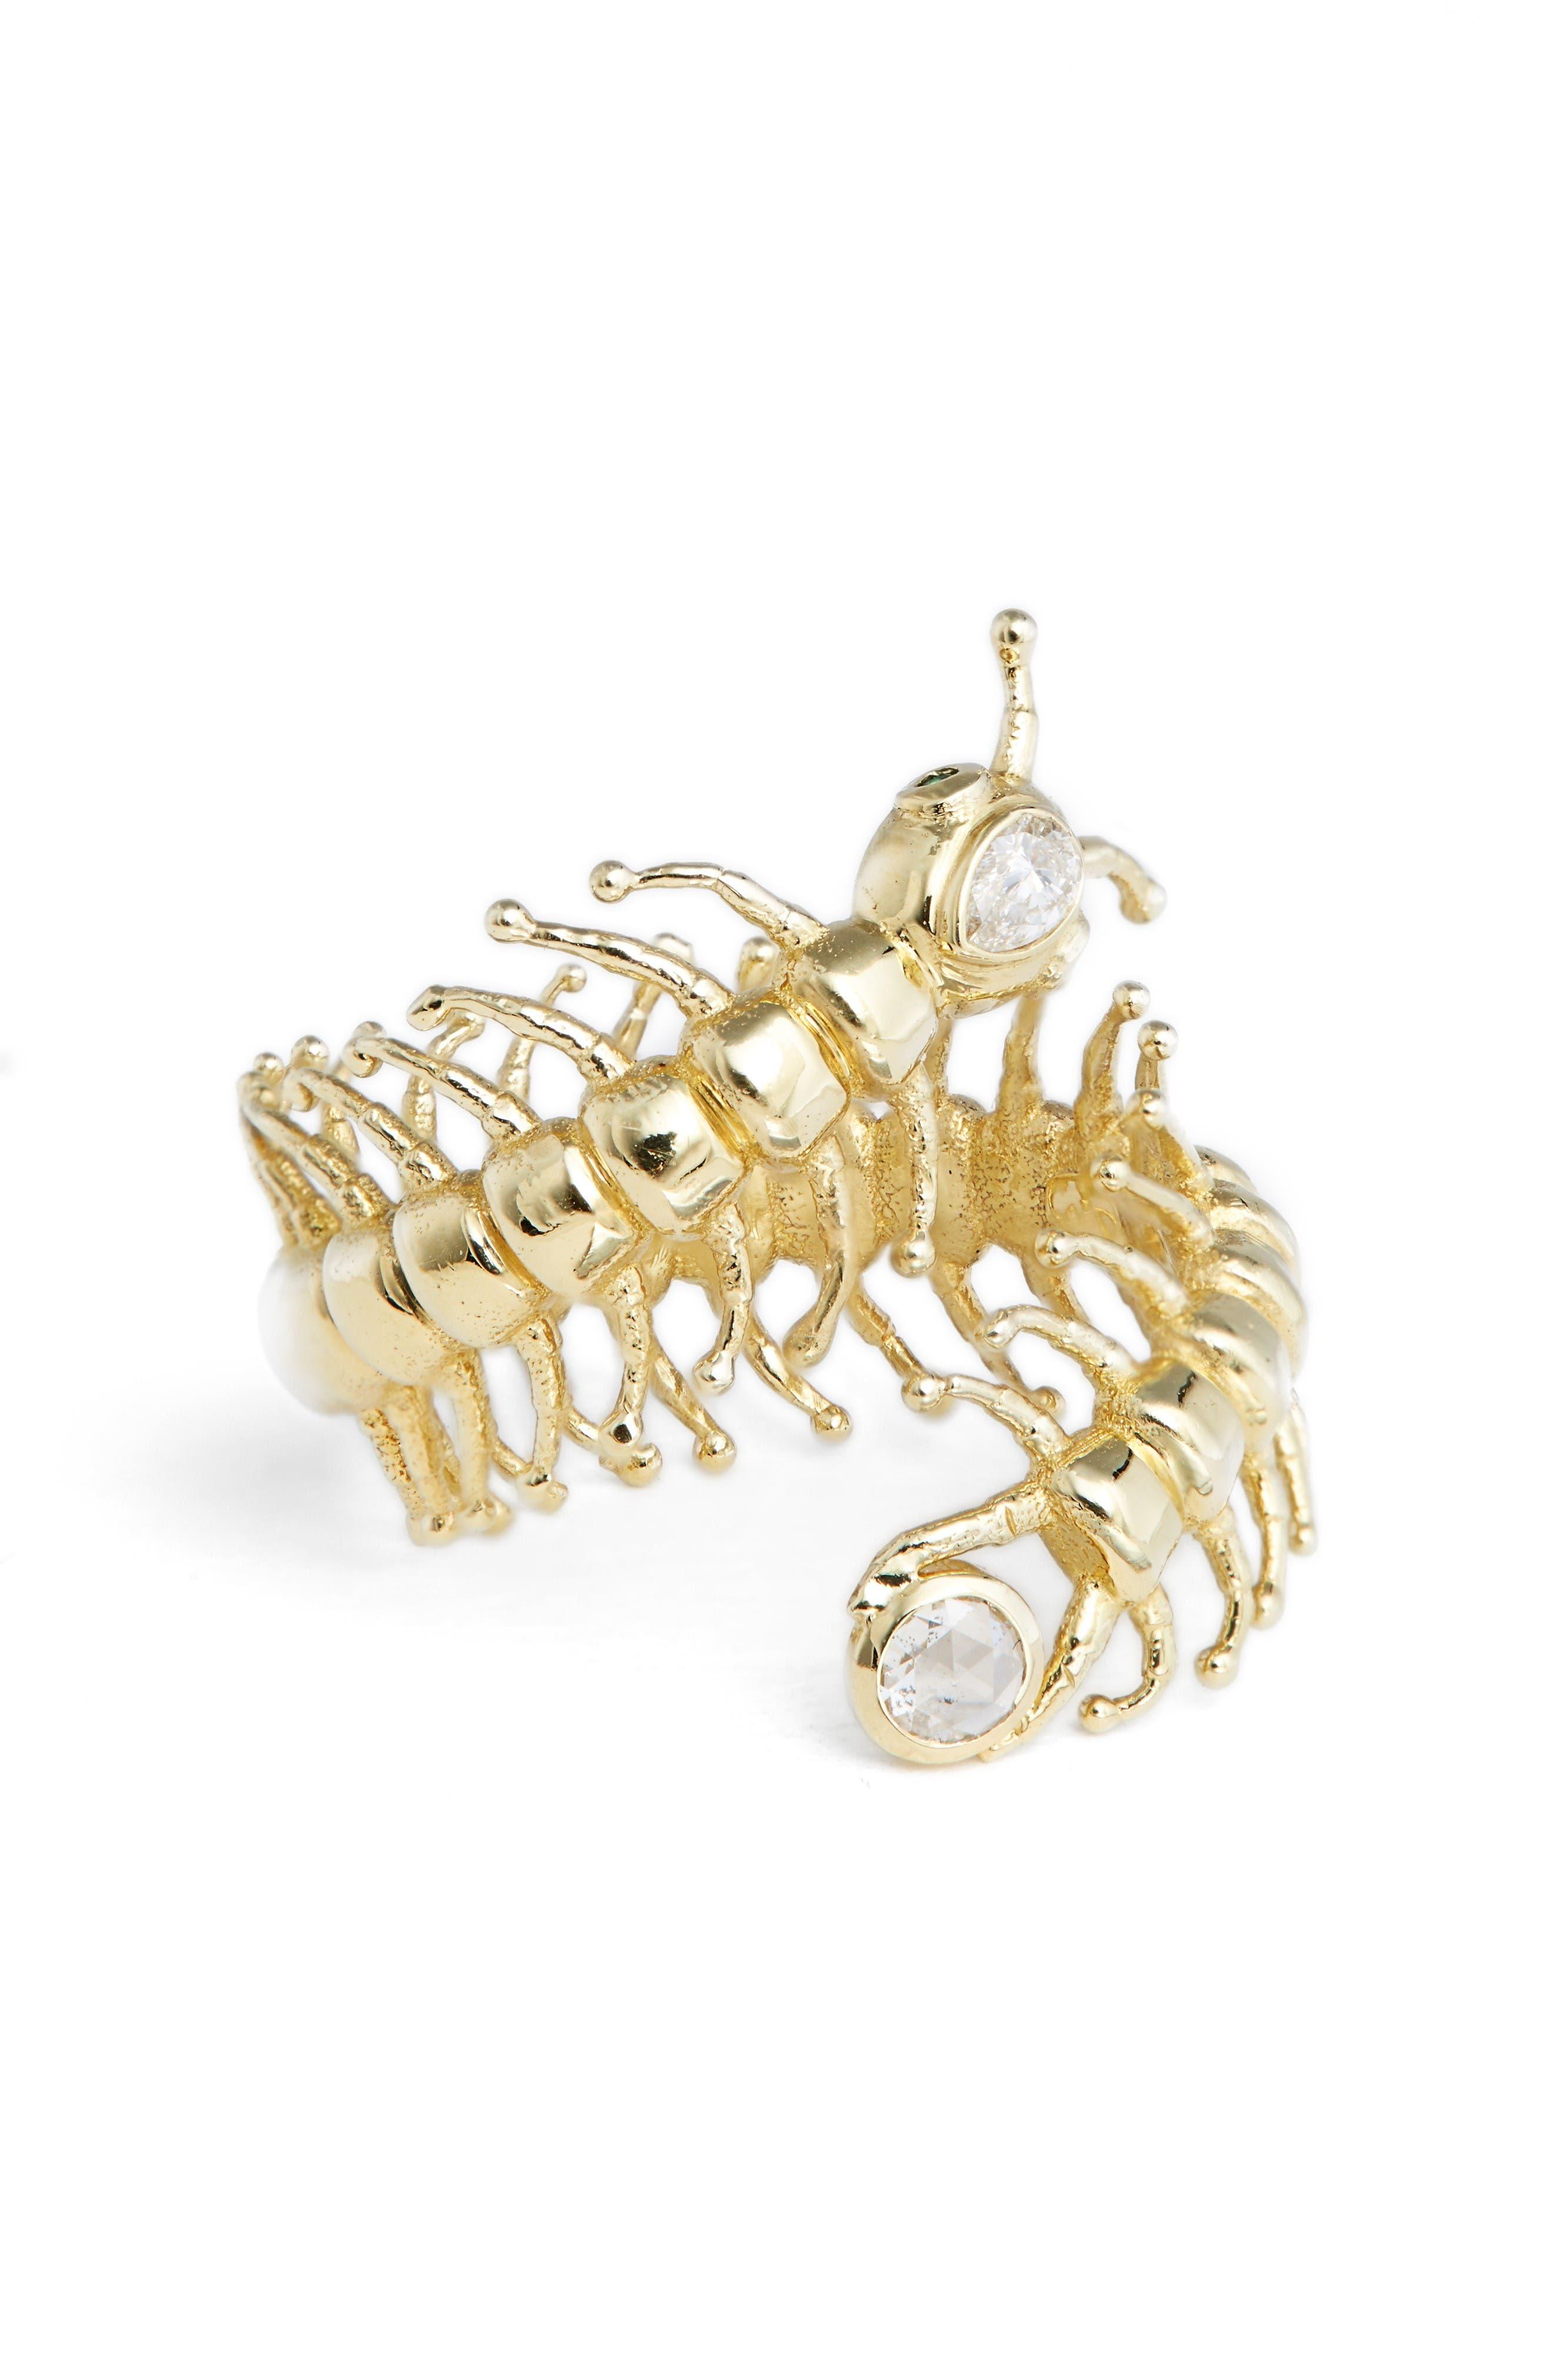 DANIELA VILLEGAS Centipede Ring